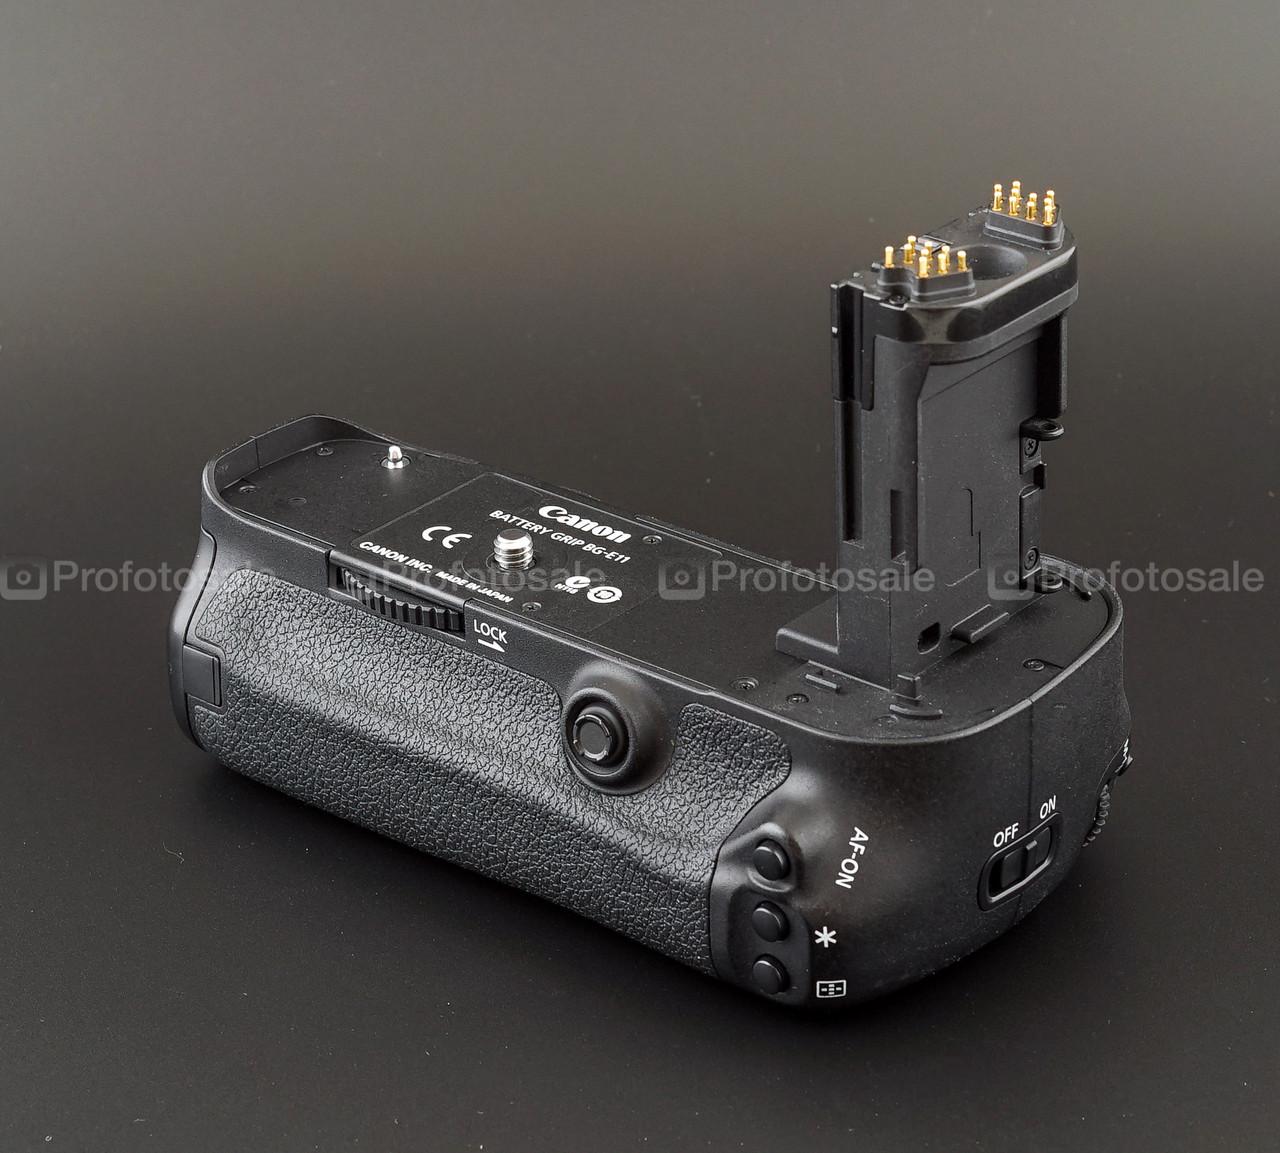 Canon BG-E11 Оригинальный бустер для Canon 5D mark III